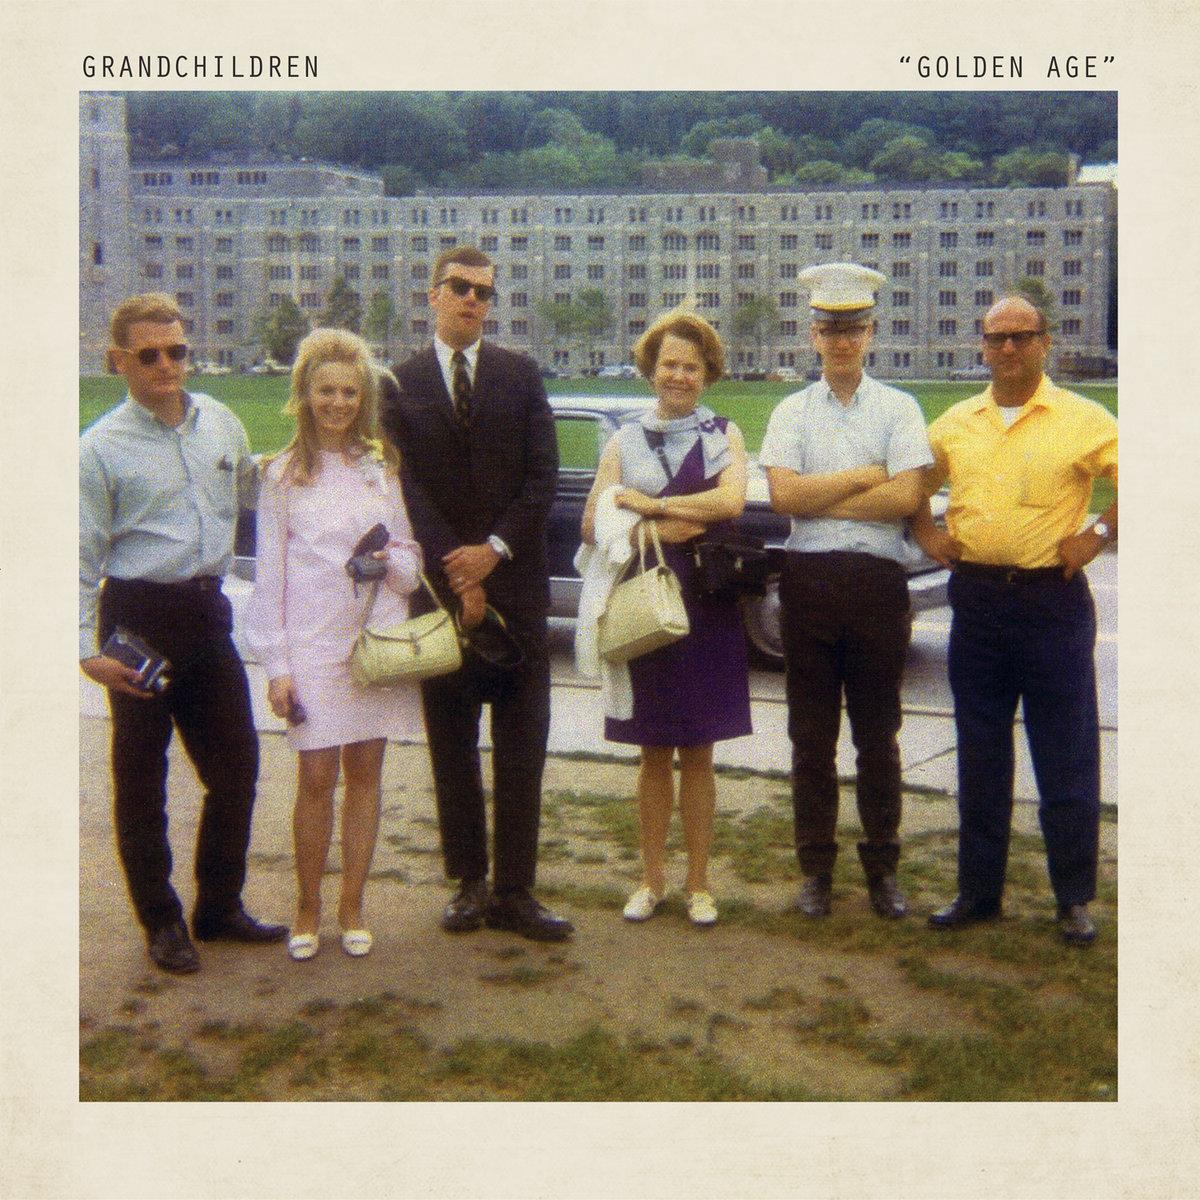 Grandchildren - Golden Age